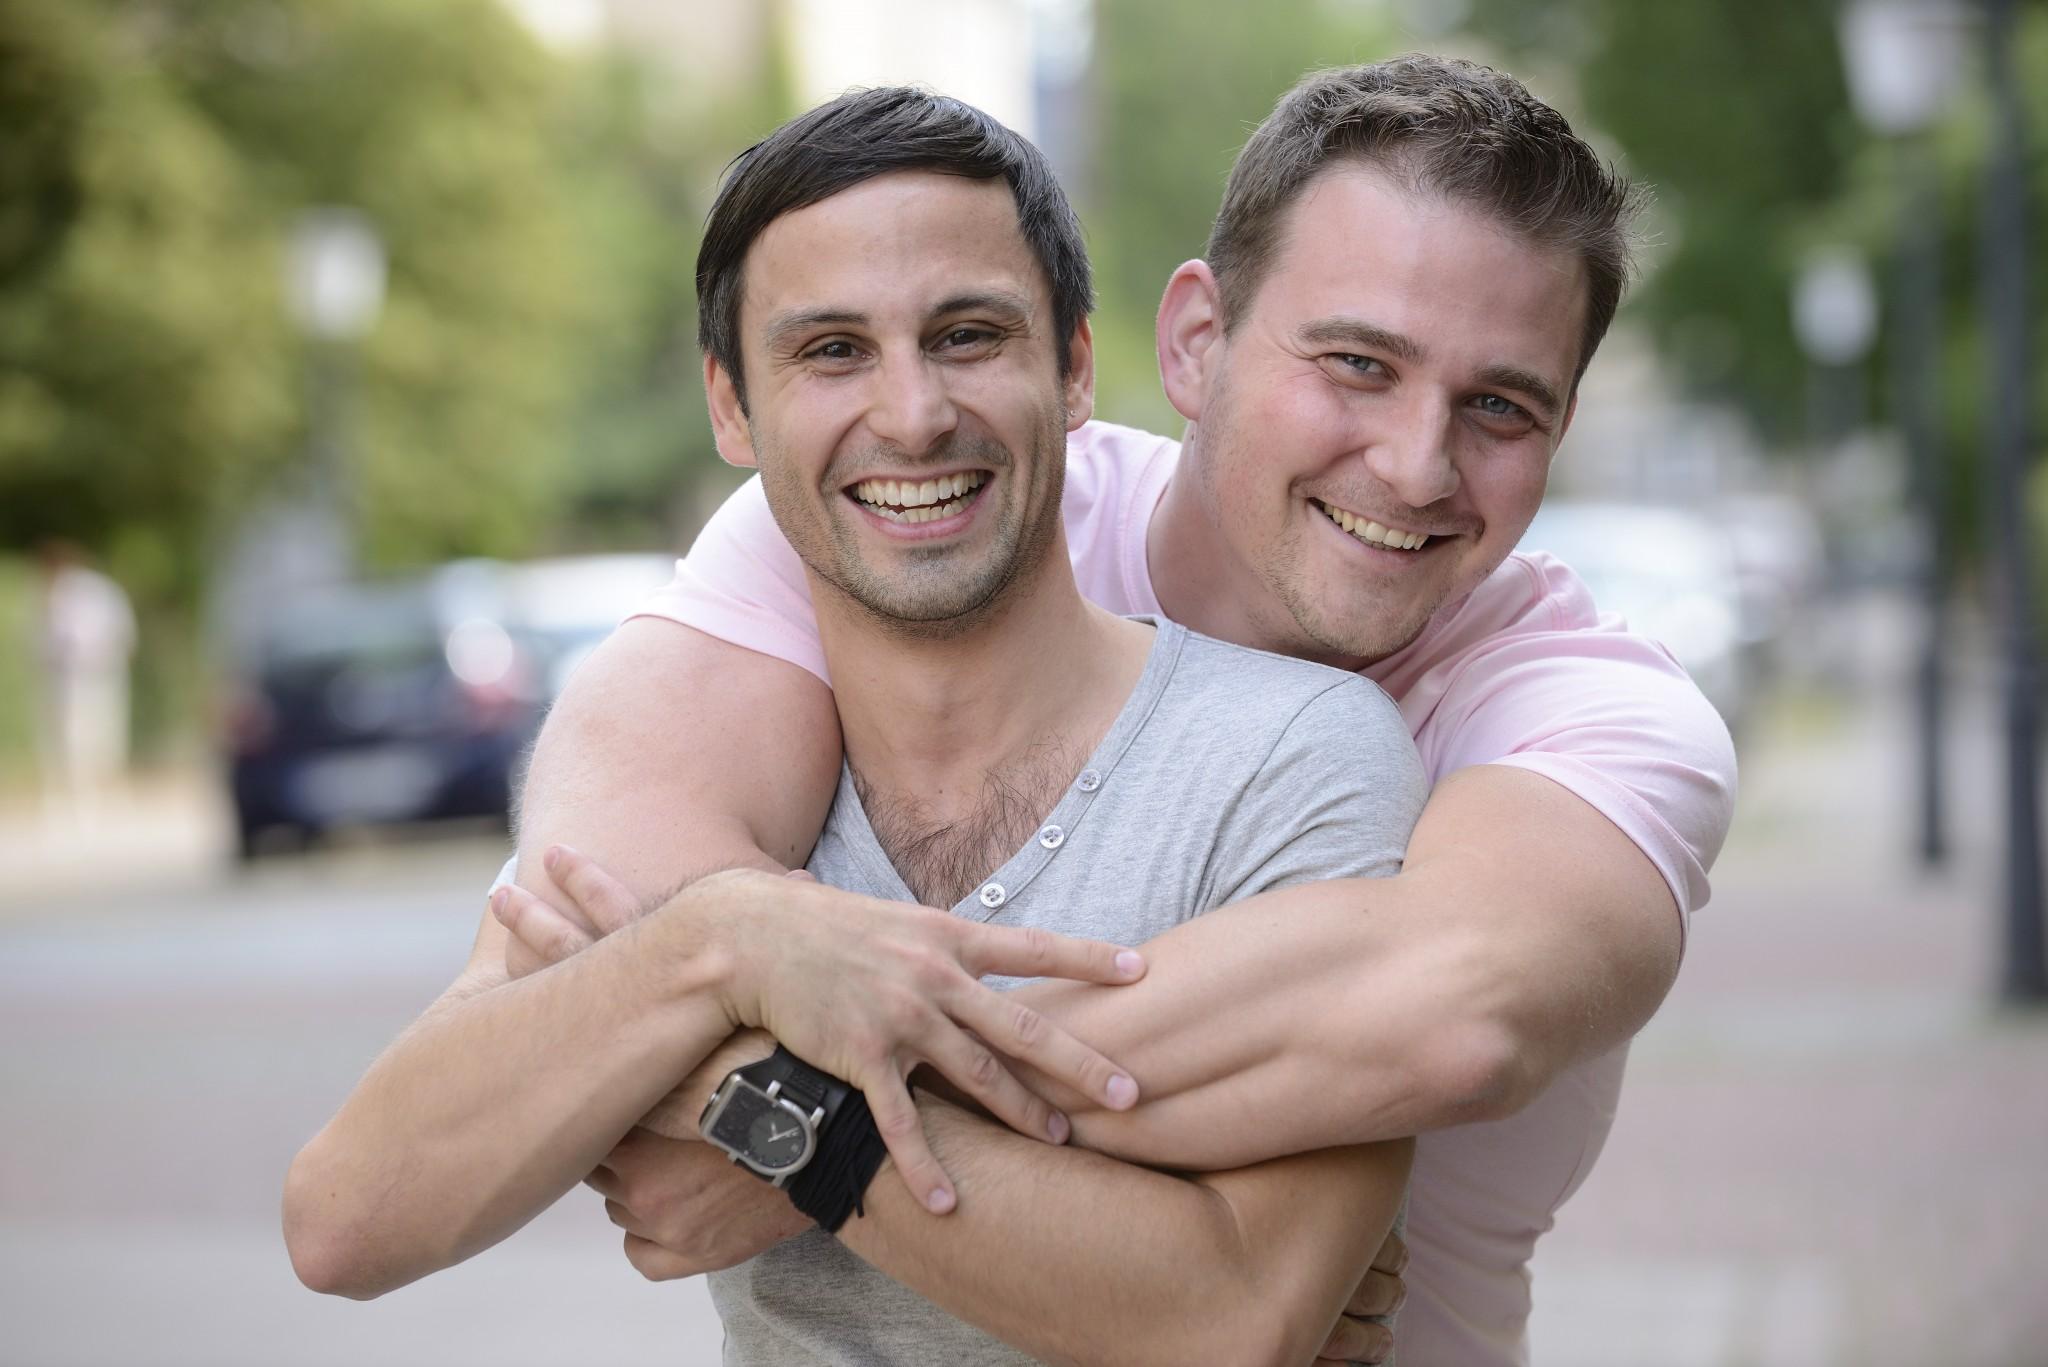 bigstock-Portrait-of-a-happy-gay-couple-34791707.jpg